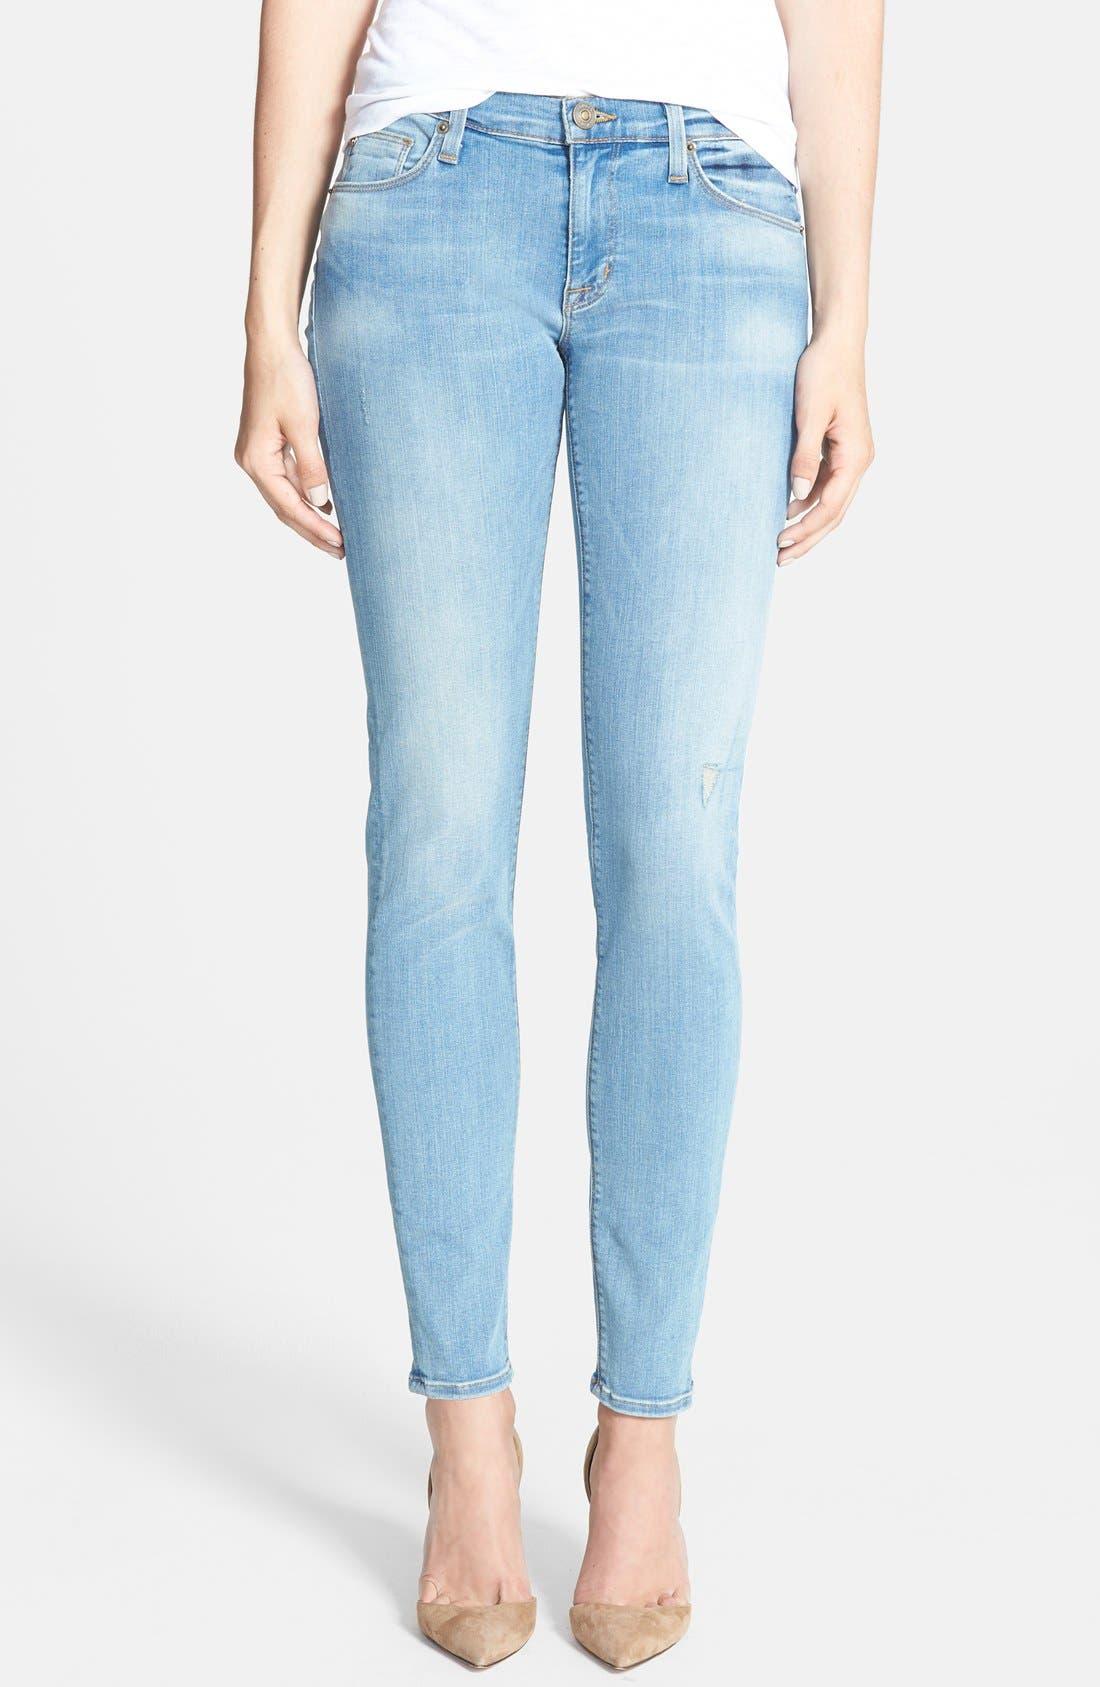 Main Image - Hudson Jeans 'Krista' Super Skinny Jeans (Mischief)